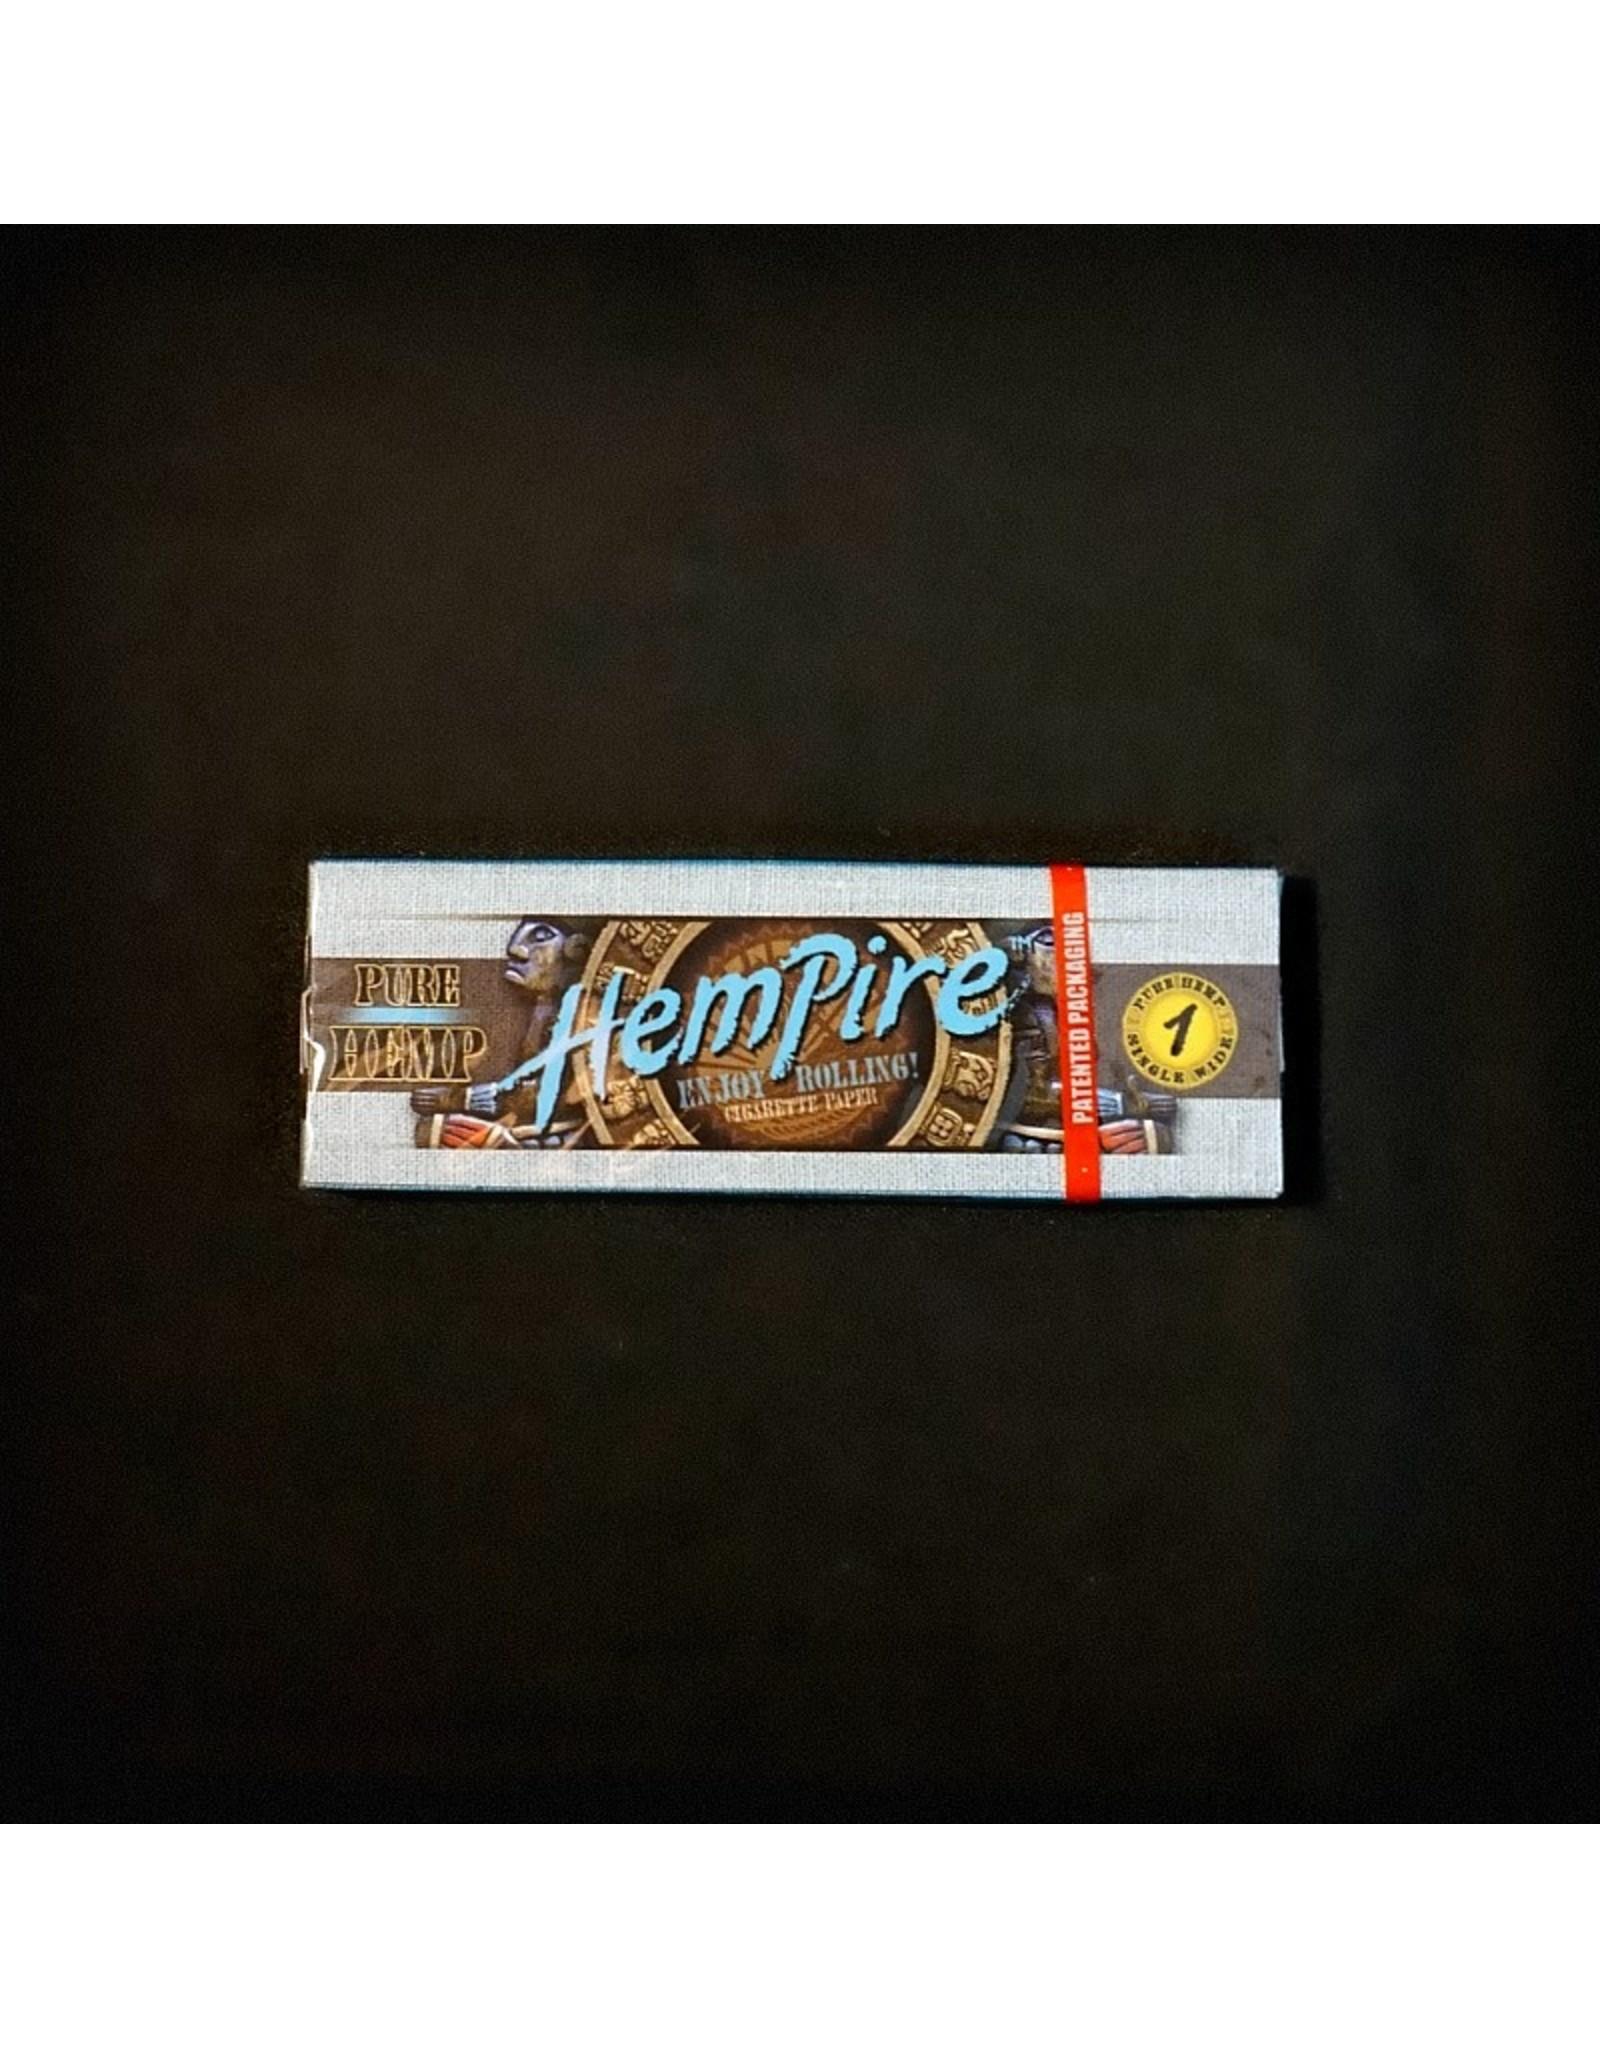 Hempire Hempire Super Wide Thin